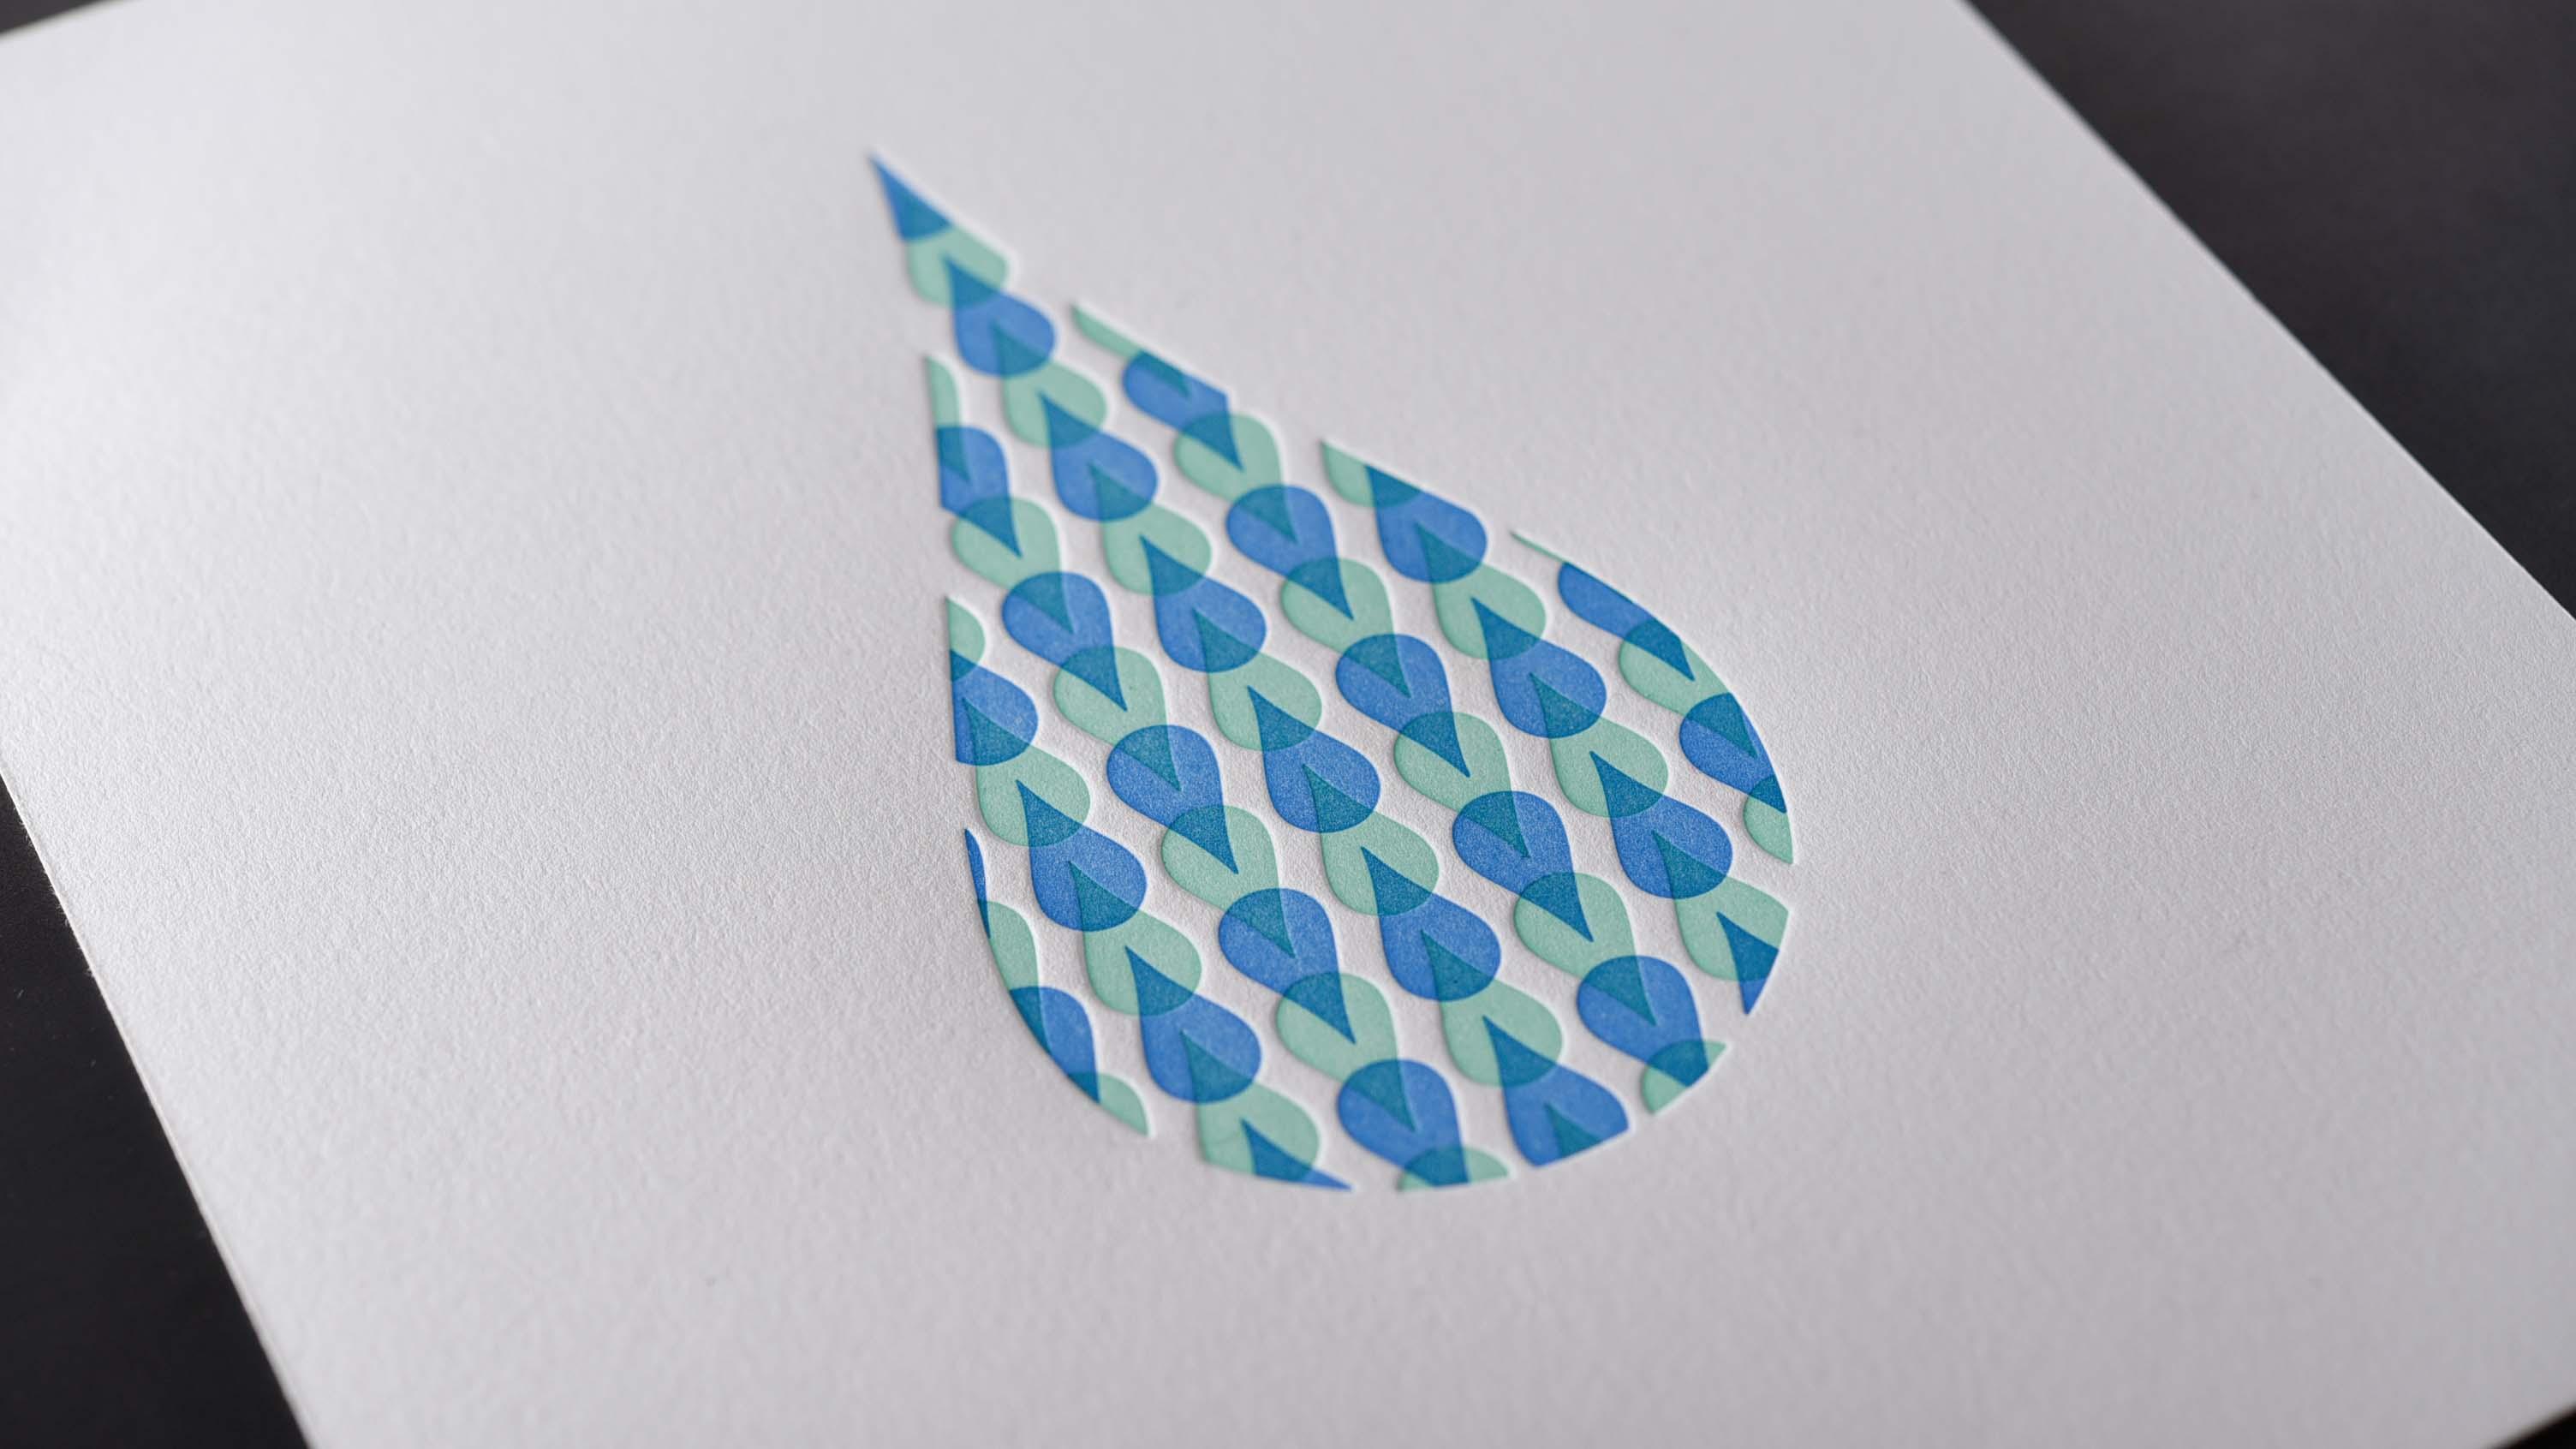 raindrop overprint small print blue and green